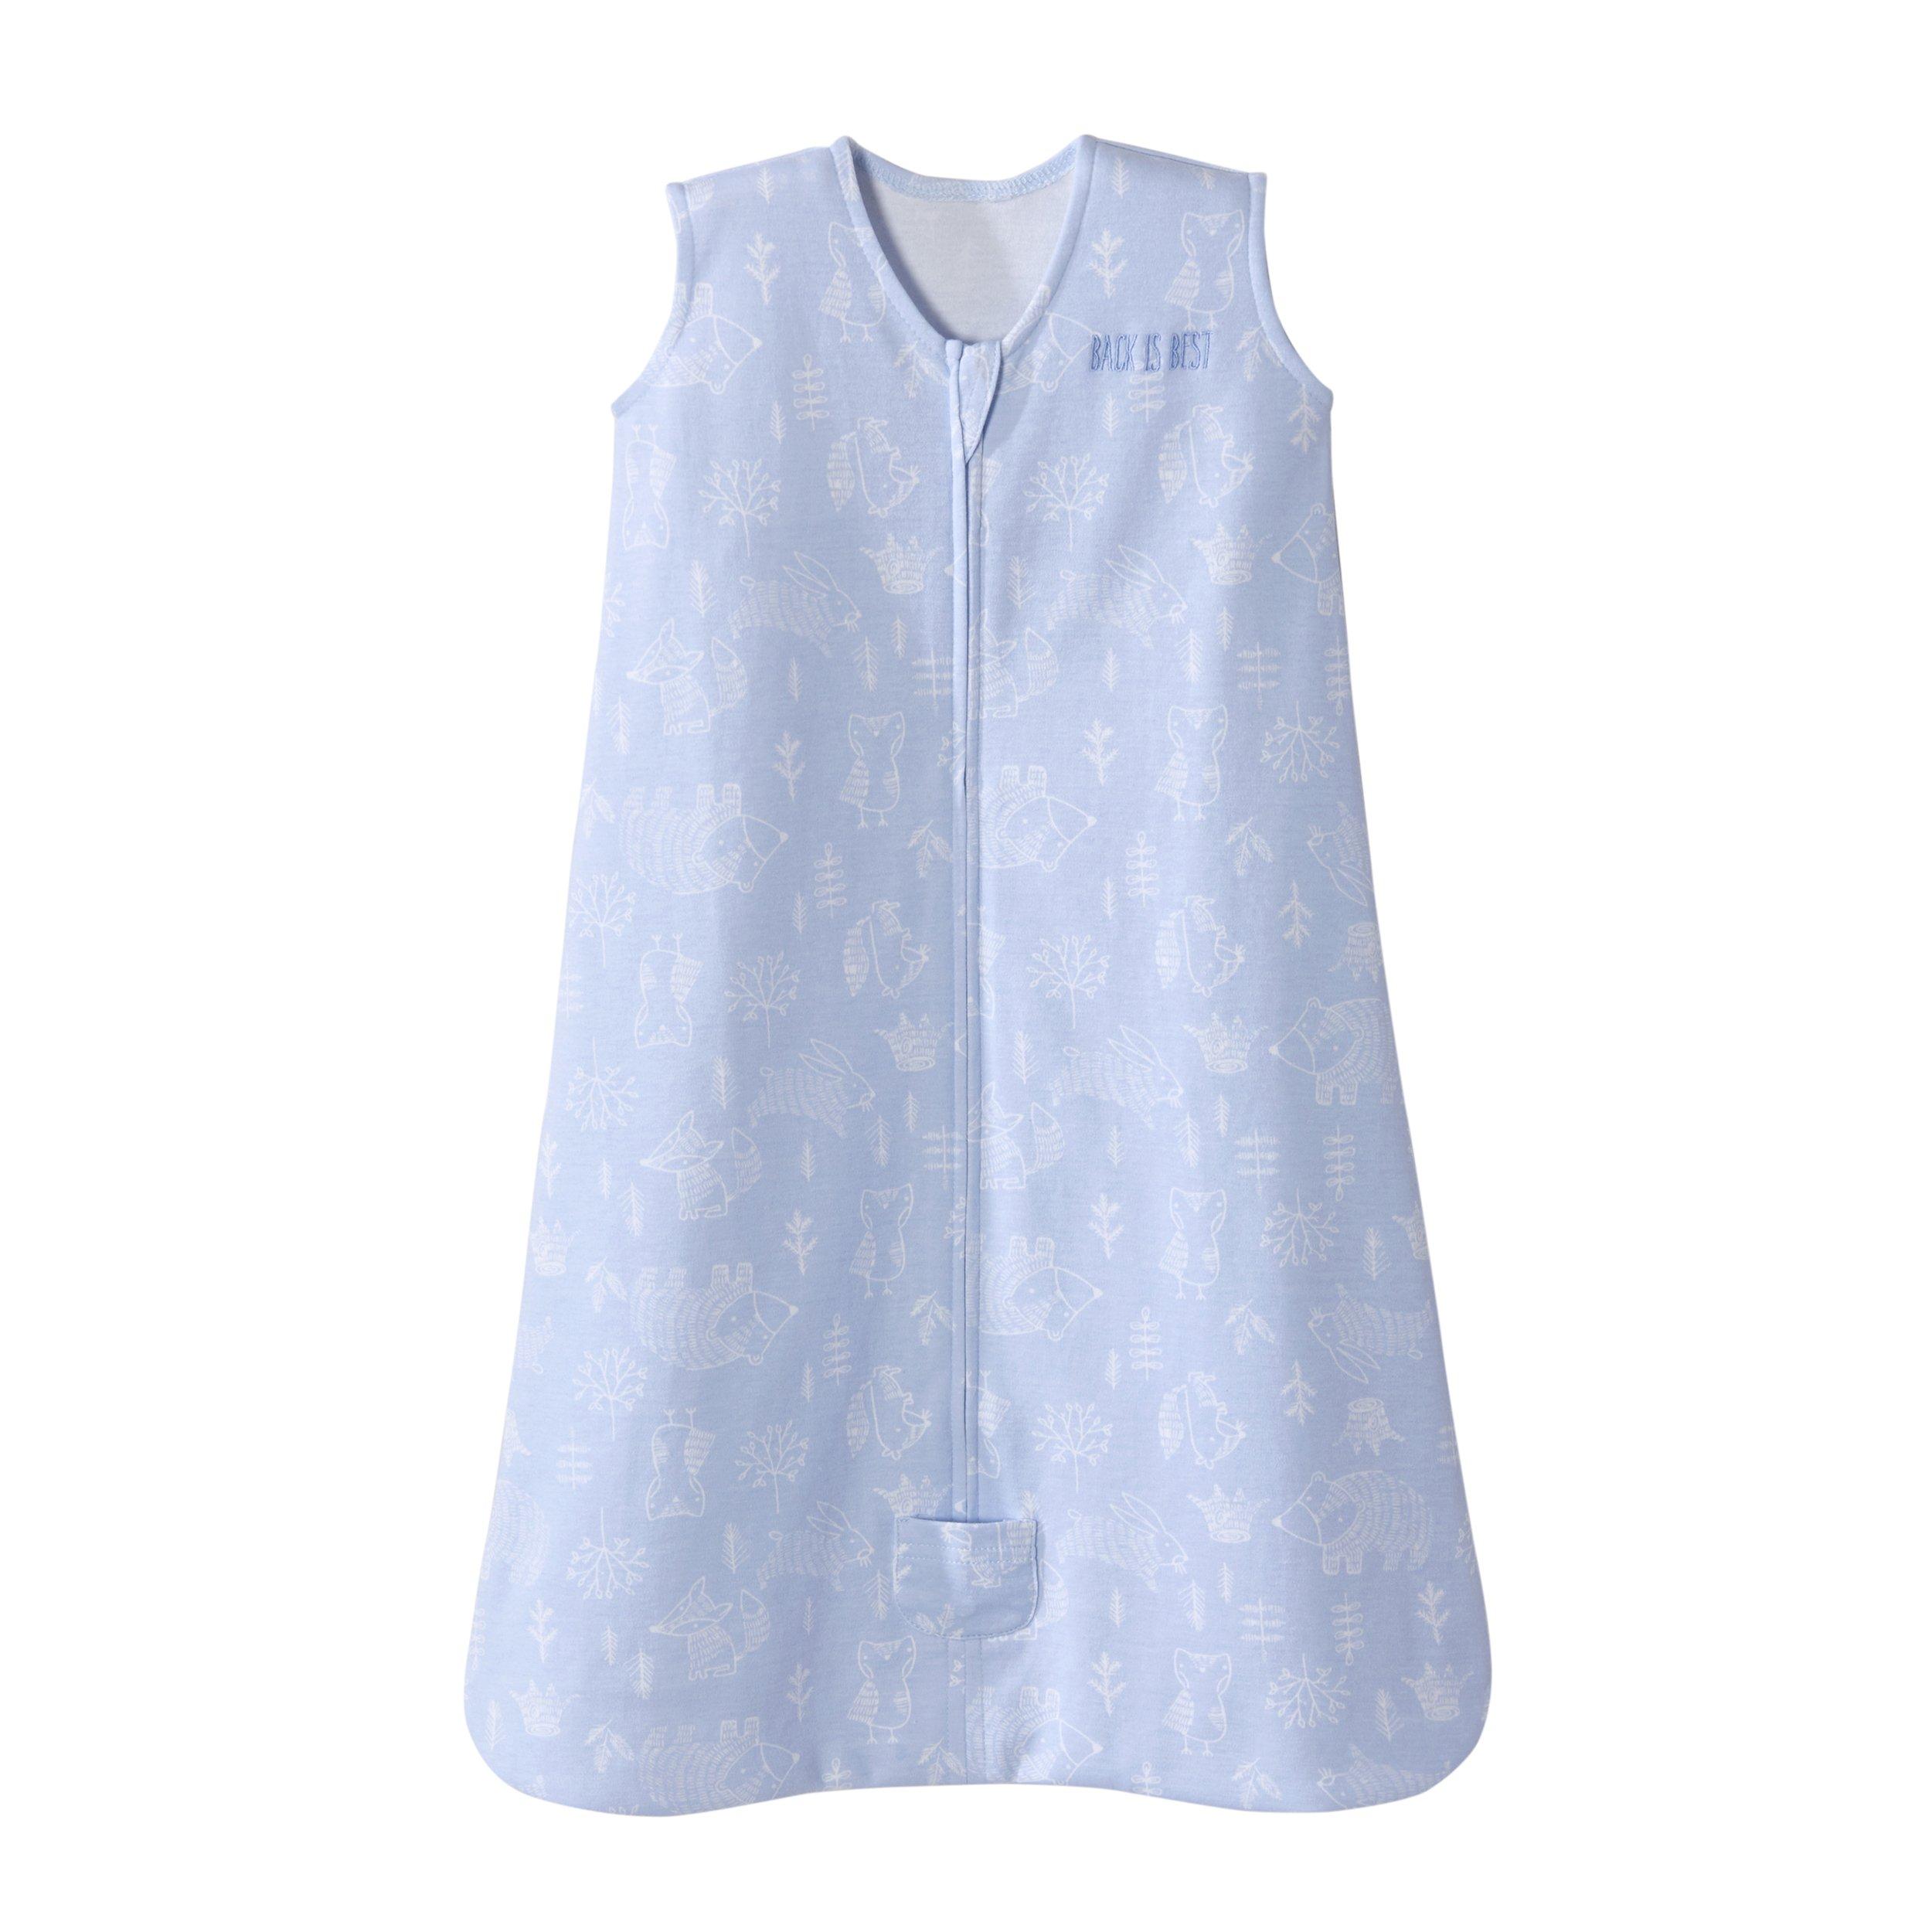 cb8a57688a Halo Sleepsack Wearable Blanket Cotton Woodland Etch Blue